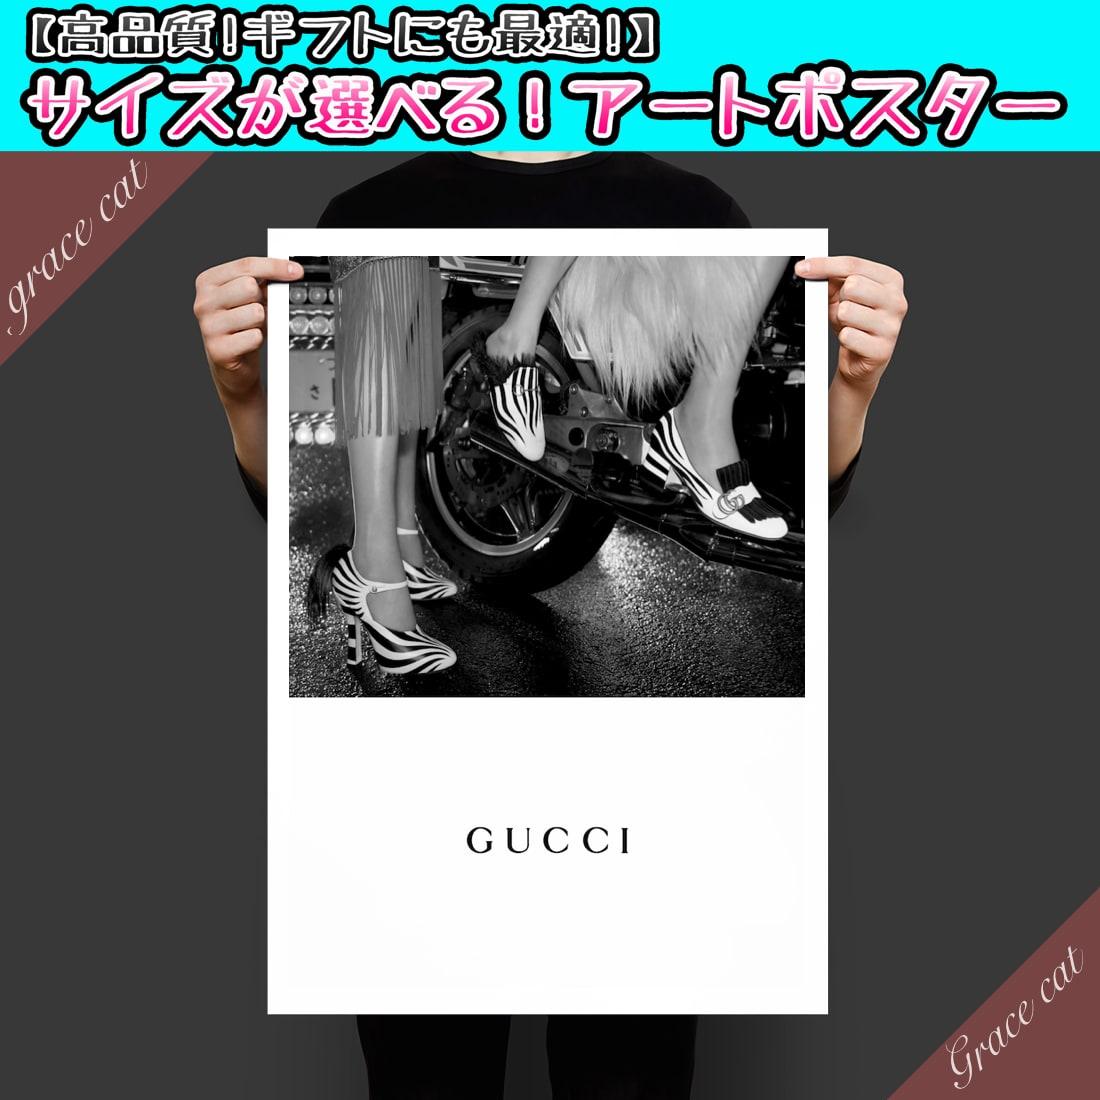 【 Grace cat Art 】サイズが選べるアートポスター / アートパネル / キャンバスパネル アート / グラフィック アート / インテリア アート / パロディアート / ギフト 【 オマージュモチーフ:GUCCI / グッチ 】